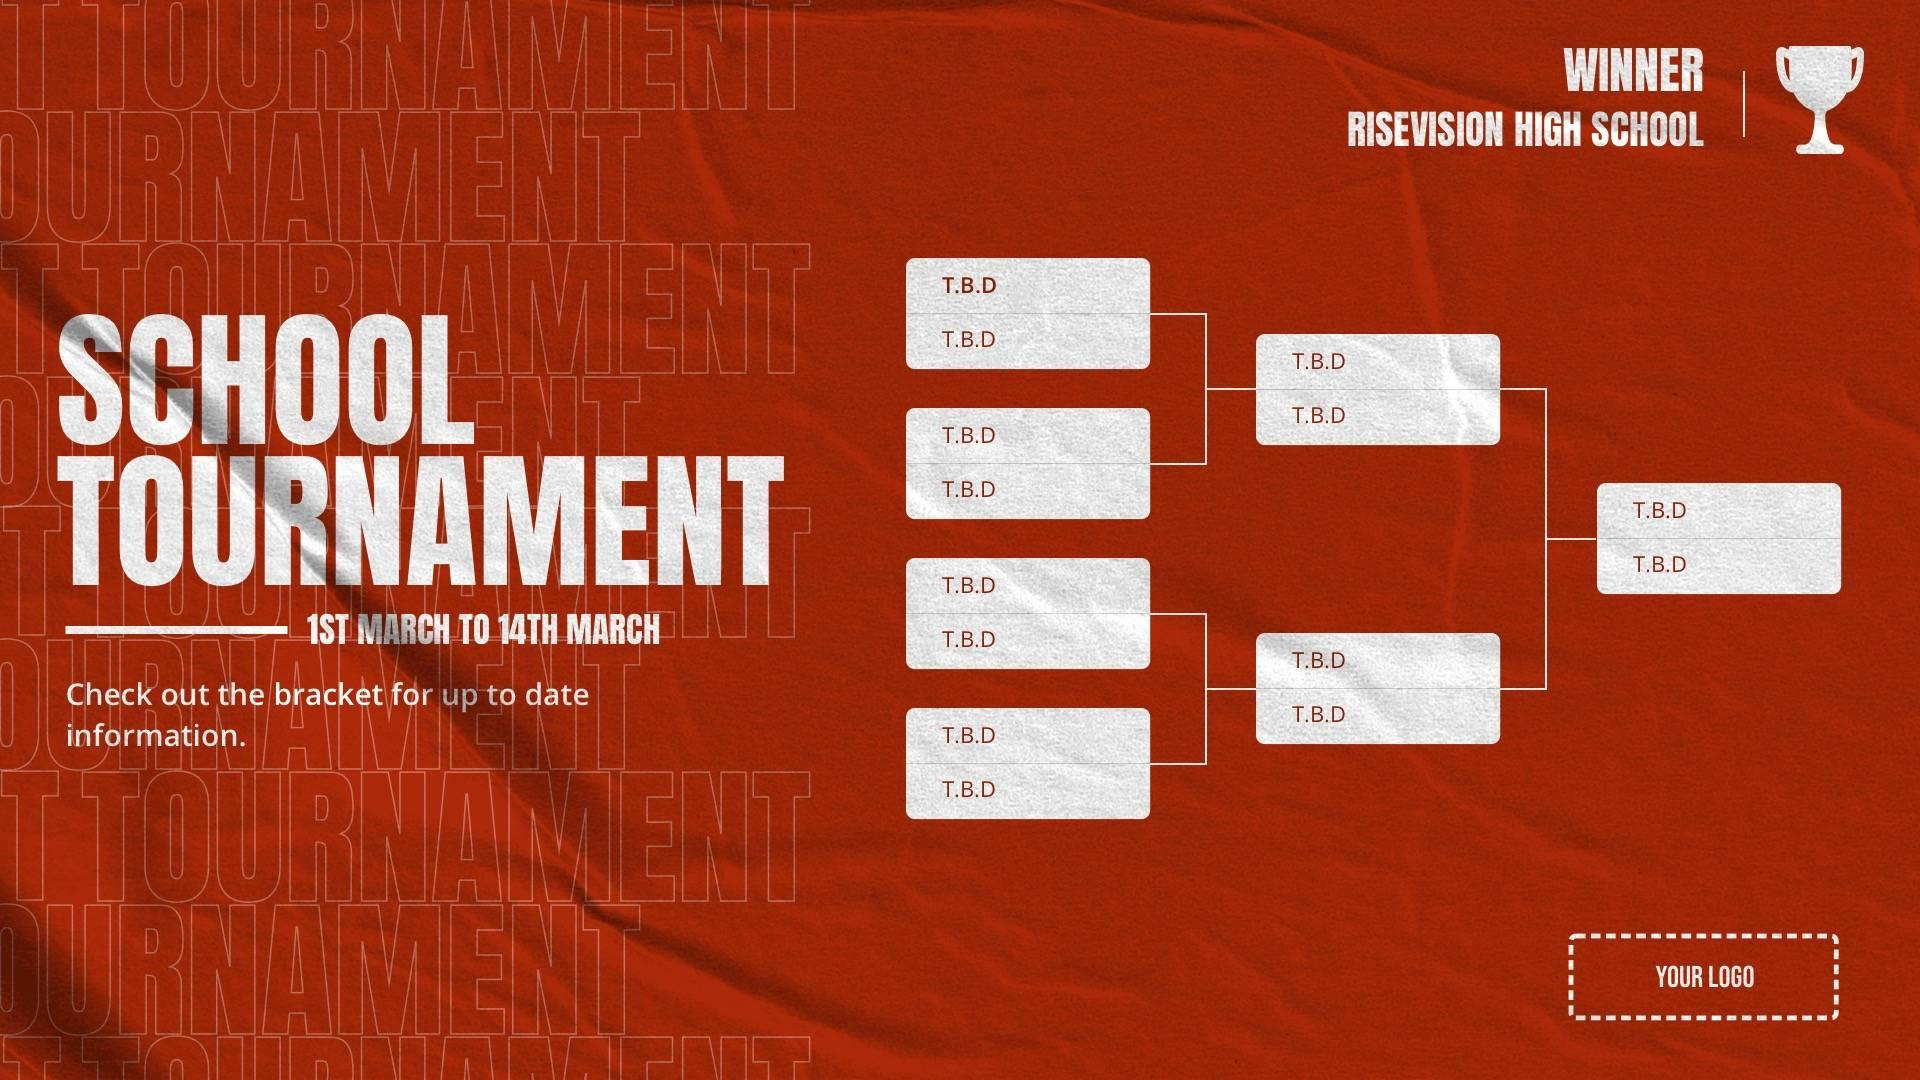 General Tournament Bracket Digital Signage Template